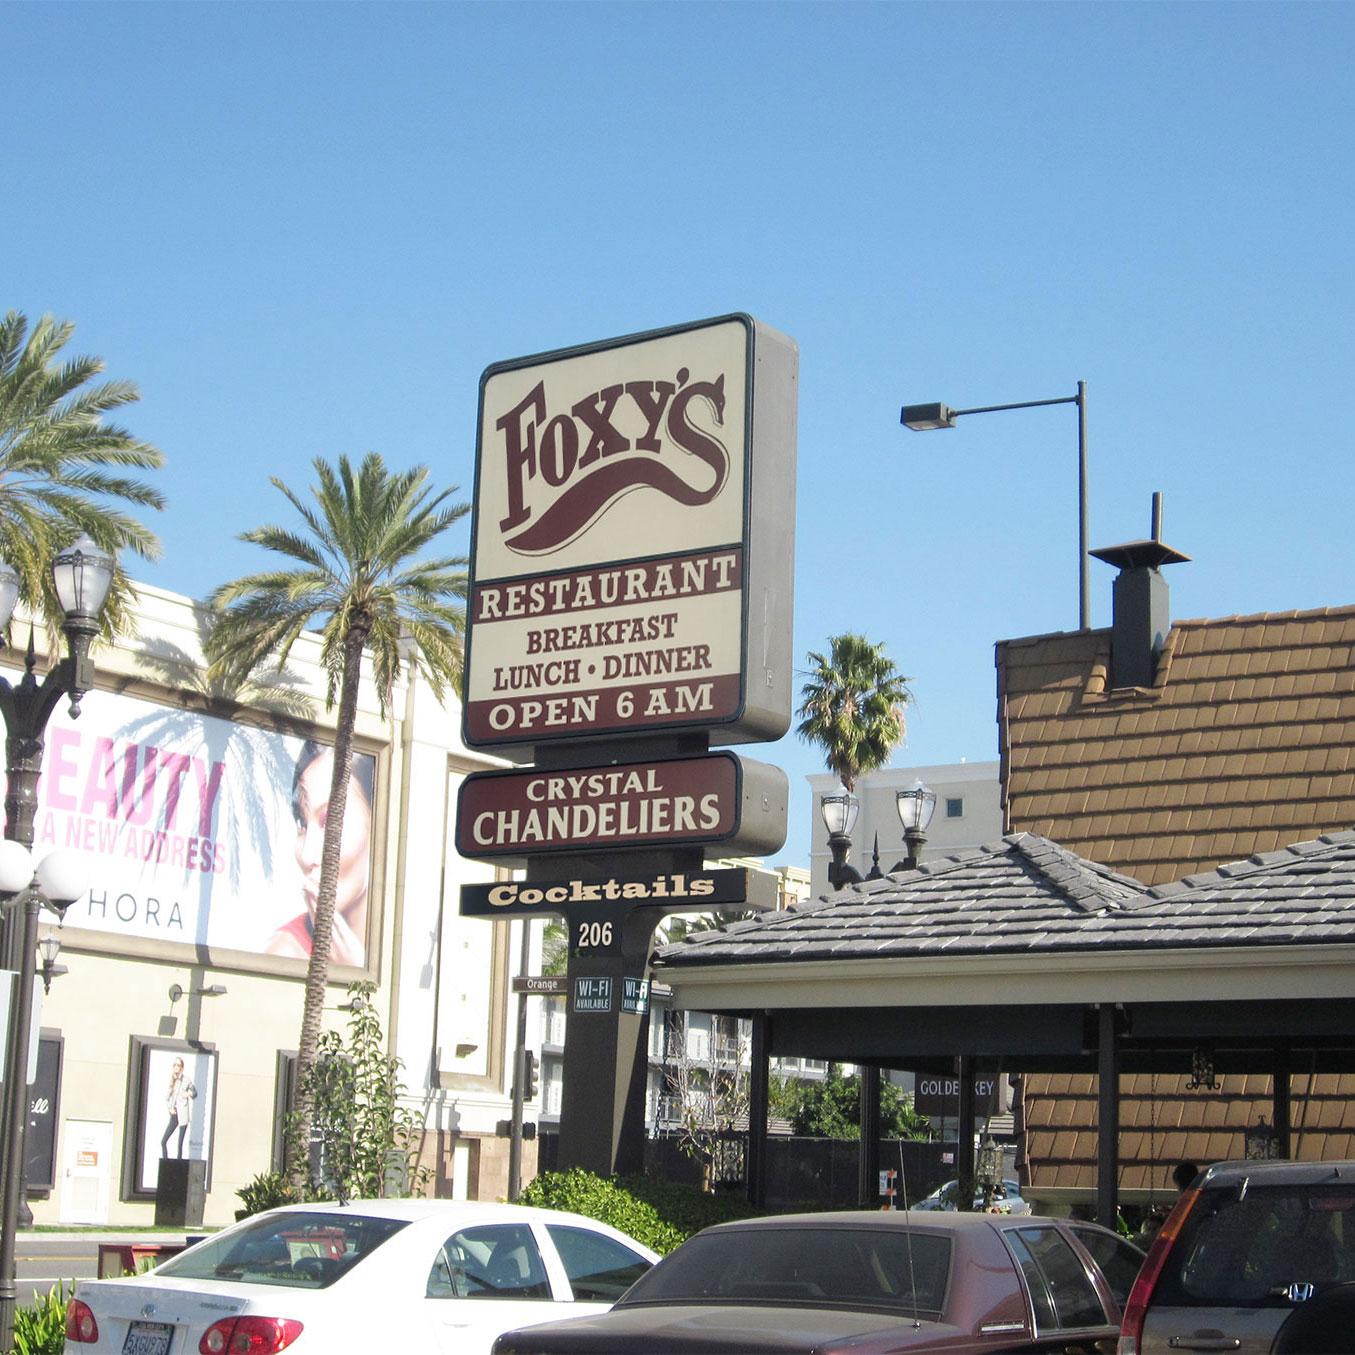 Foxy's restaurant